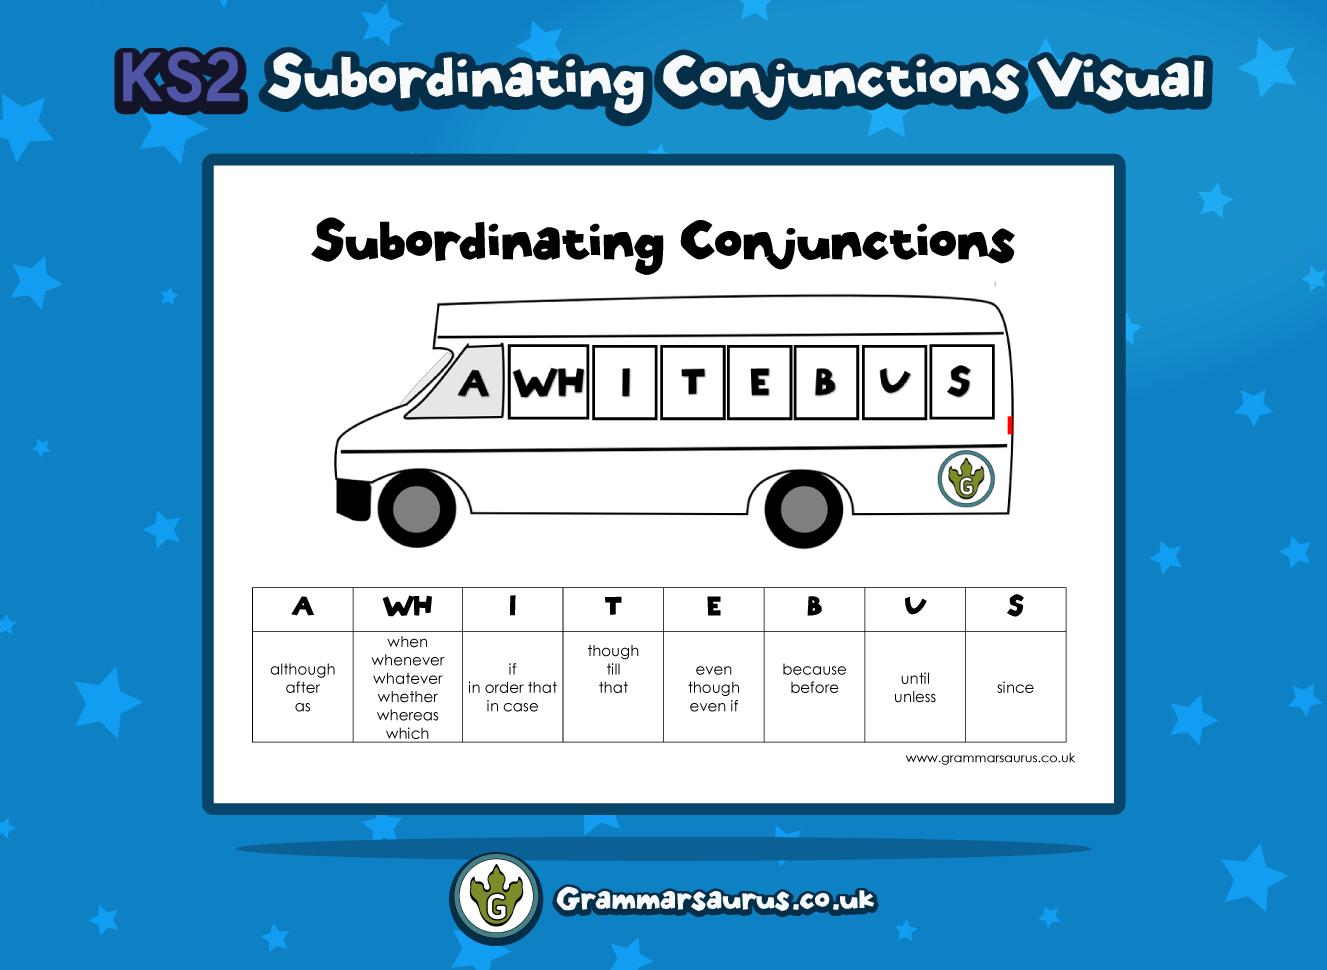 Ks2 Subordinating Conjunctions